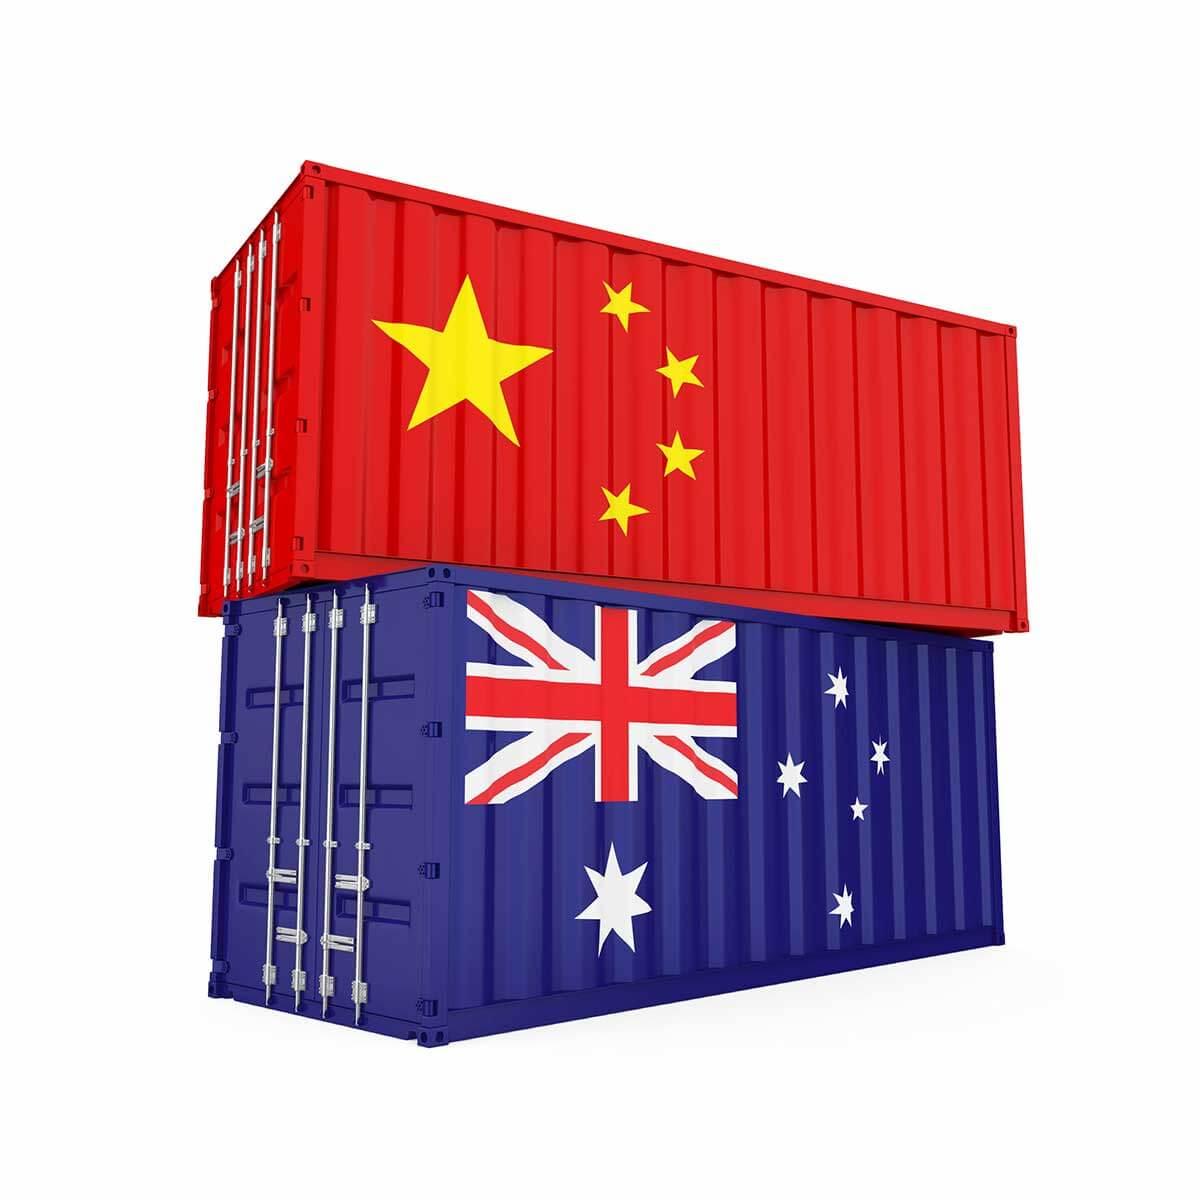 Import Export China Australia concept